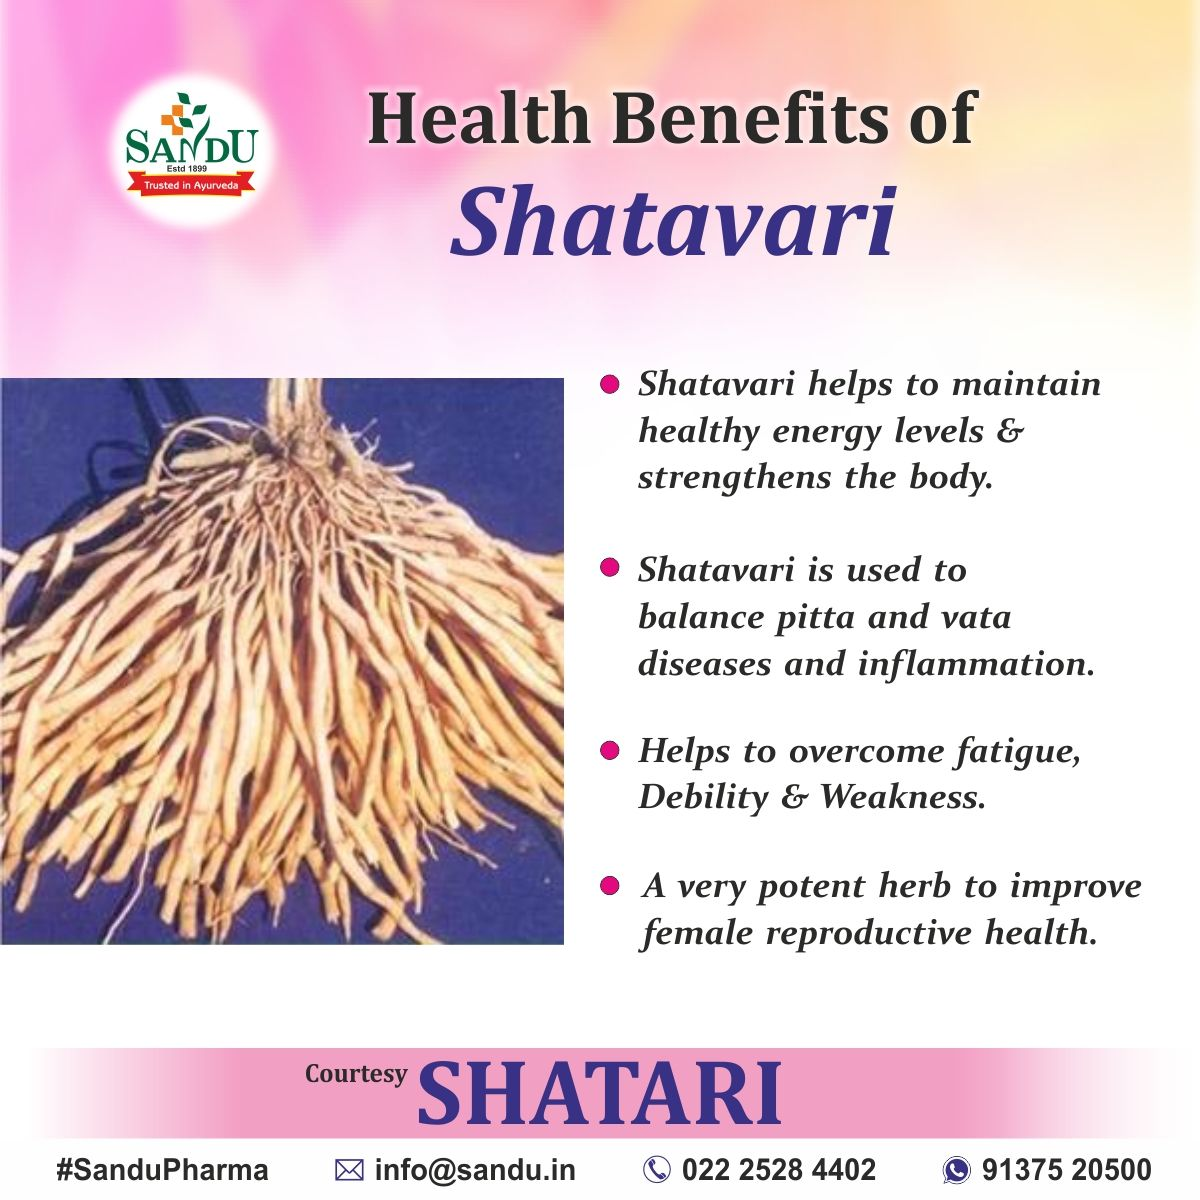 Health Benefits of Shatavari in 2020 | Health, Healthy